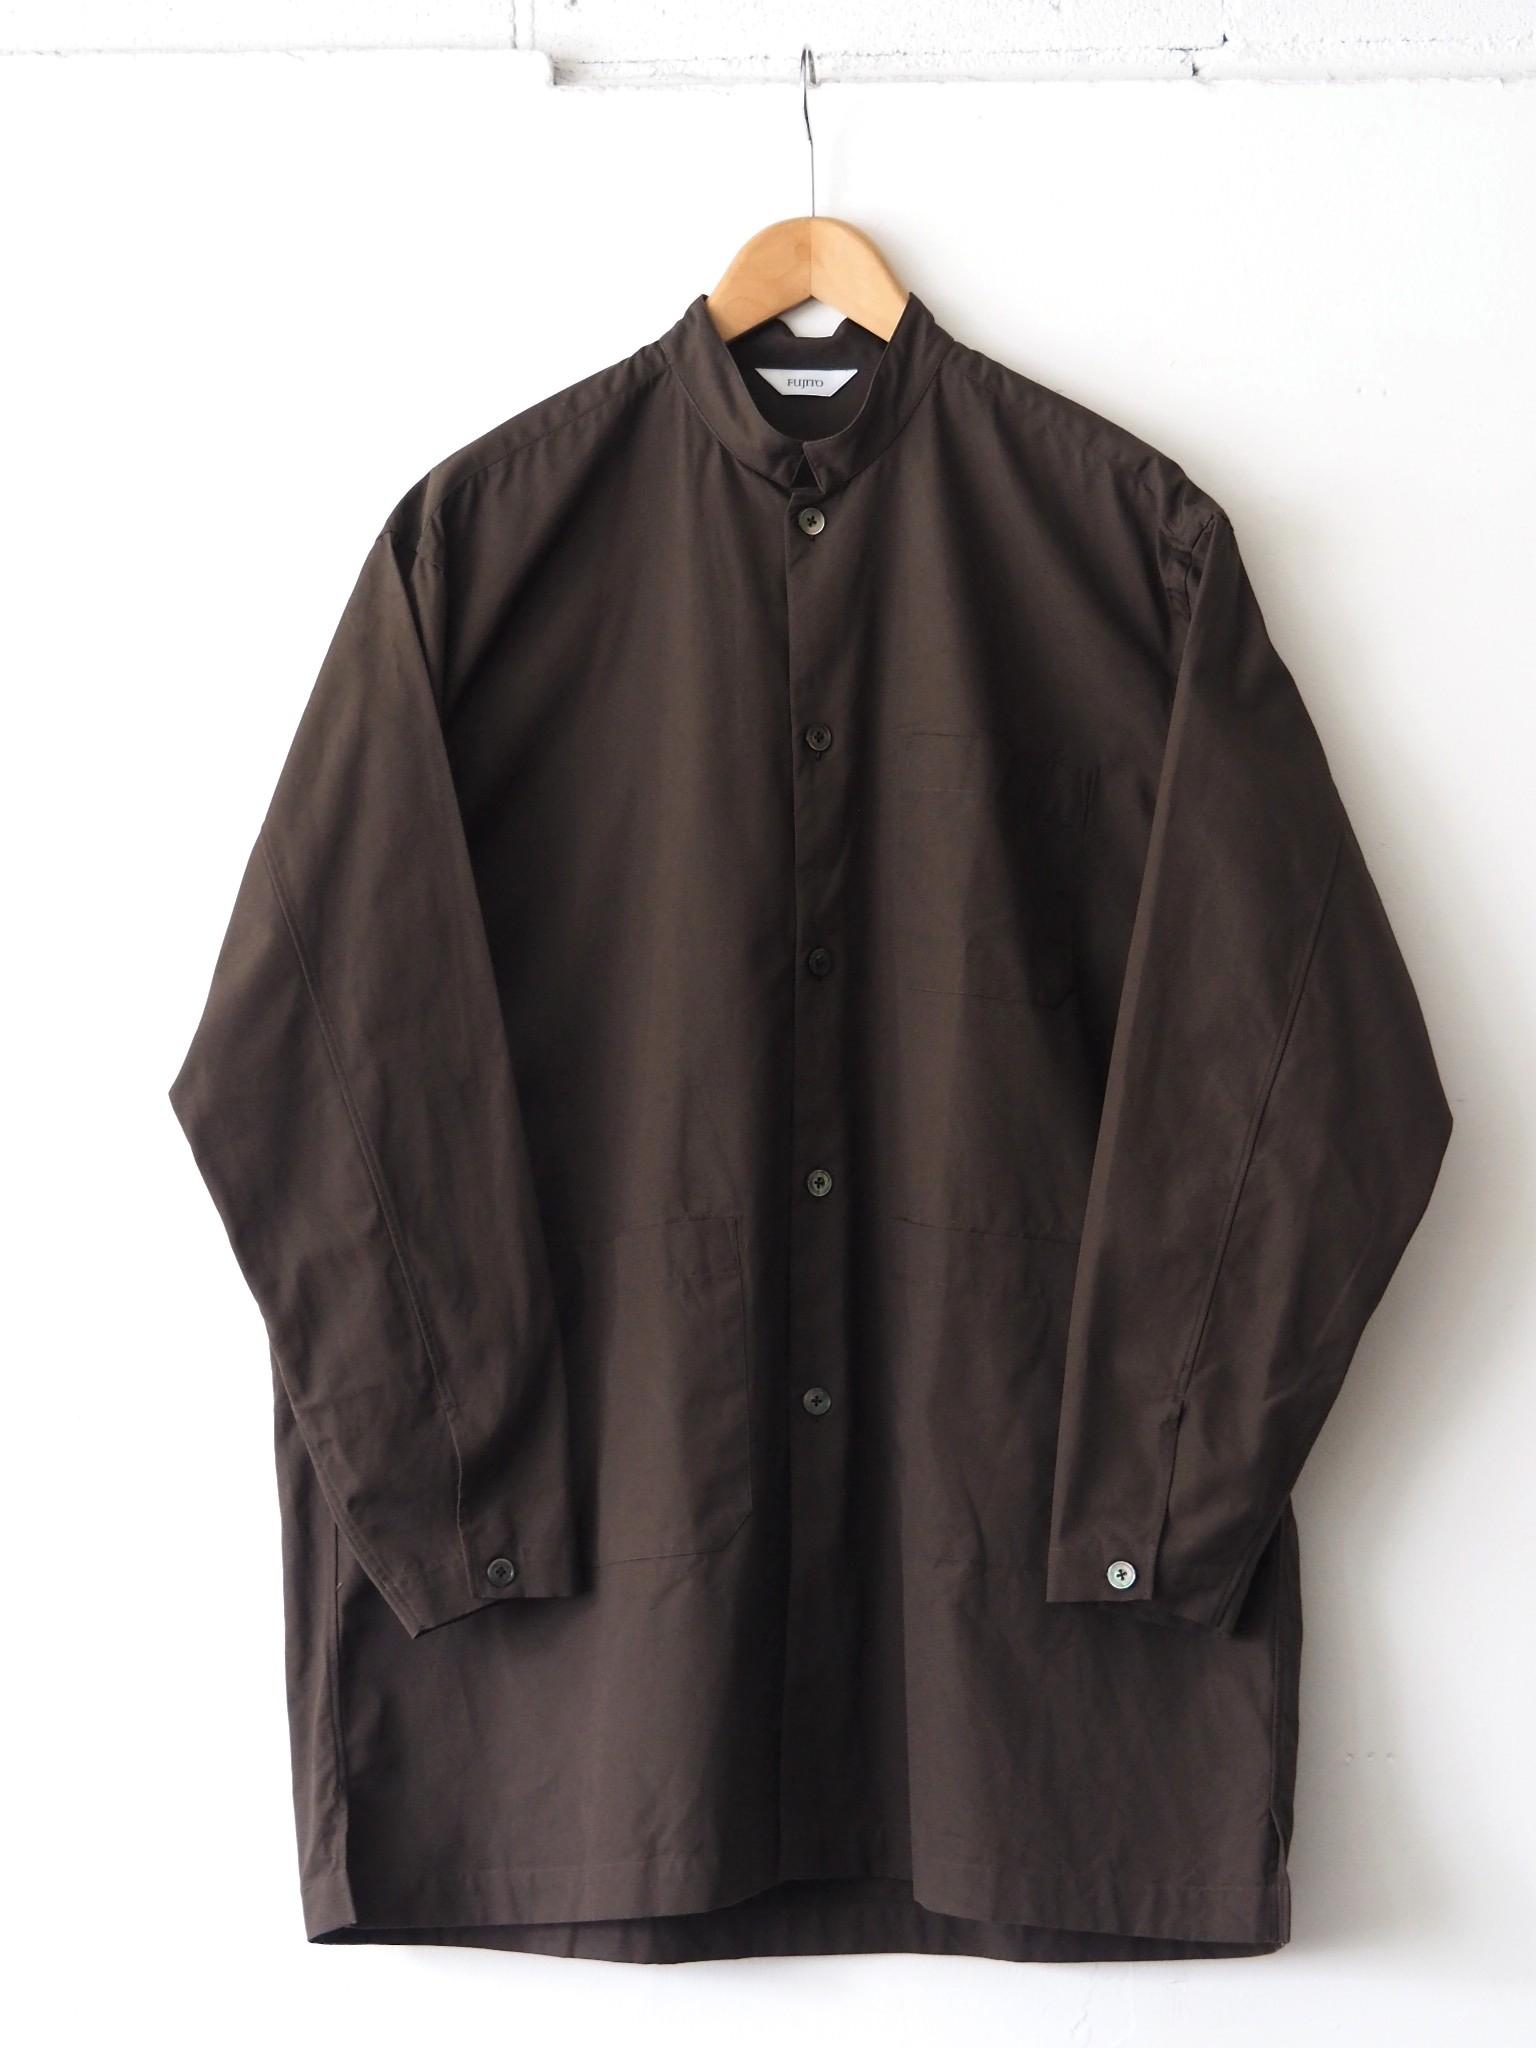 FUJITO Shirt Coatのご紹介です